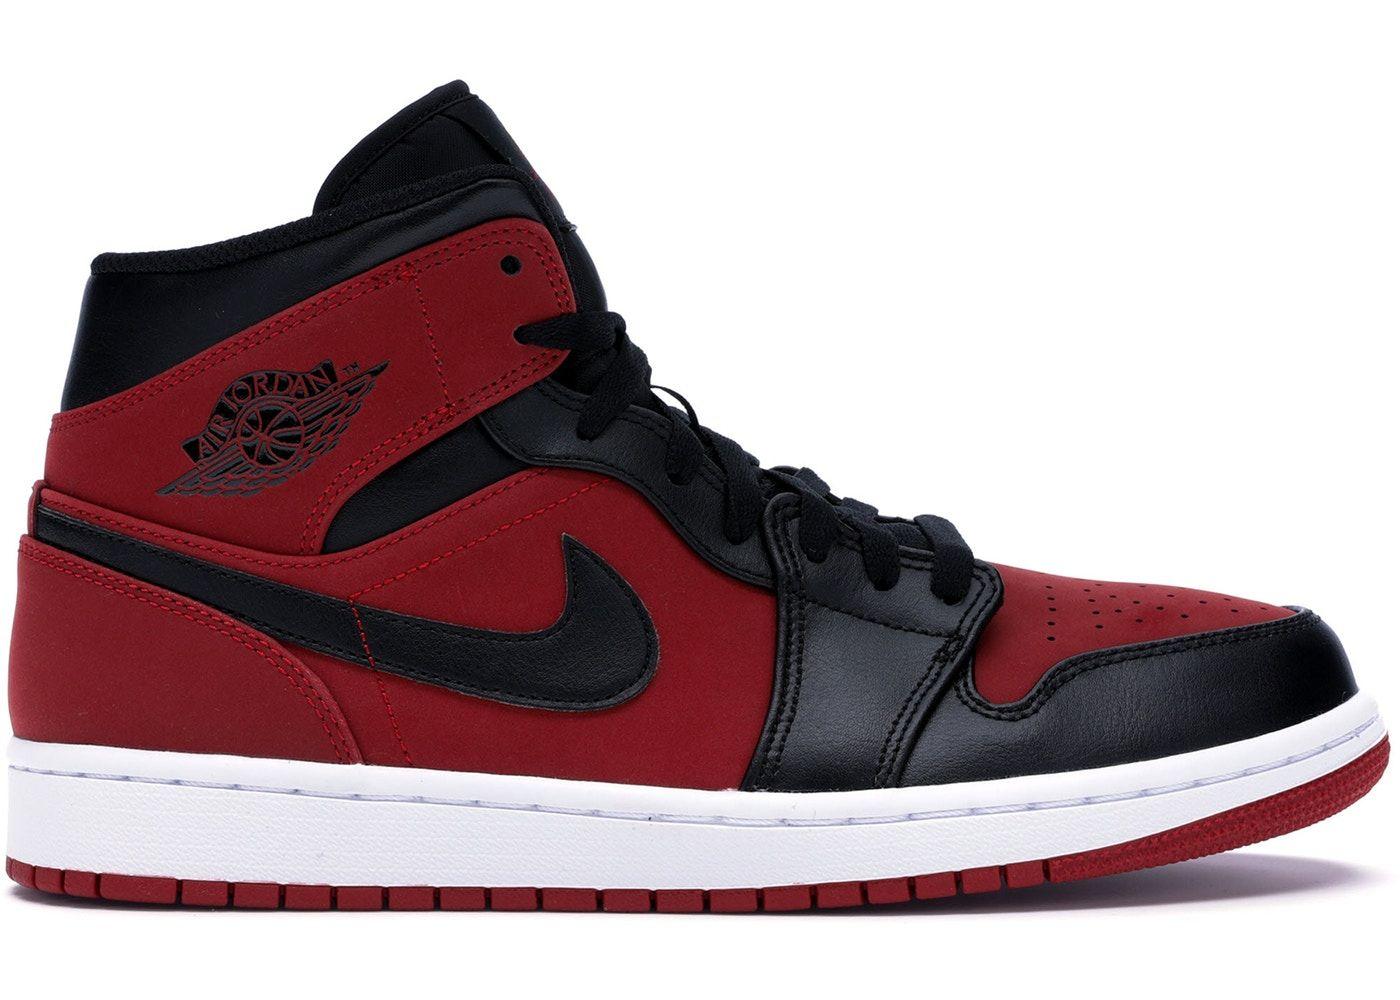 Jordan 1 Mid Gym Red Black Black Nike Shoes Nike Shoes Blue Air Jordans